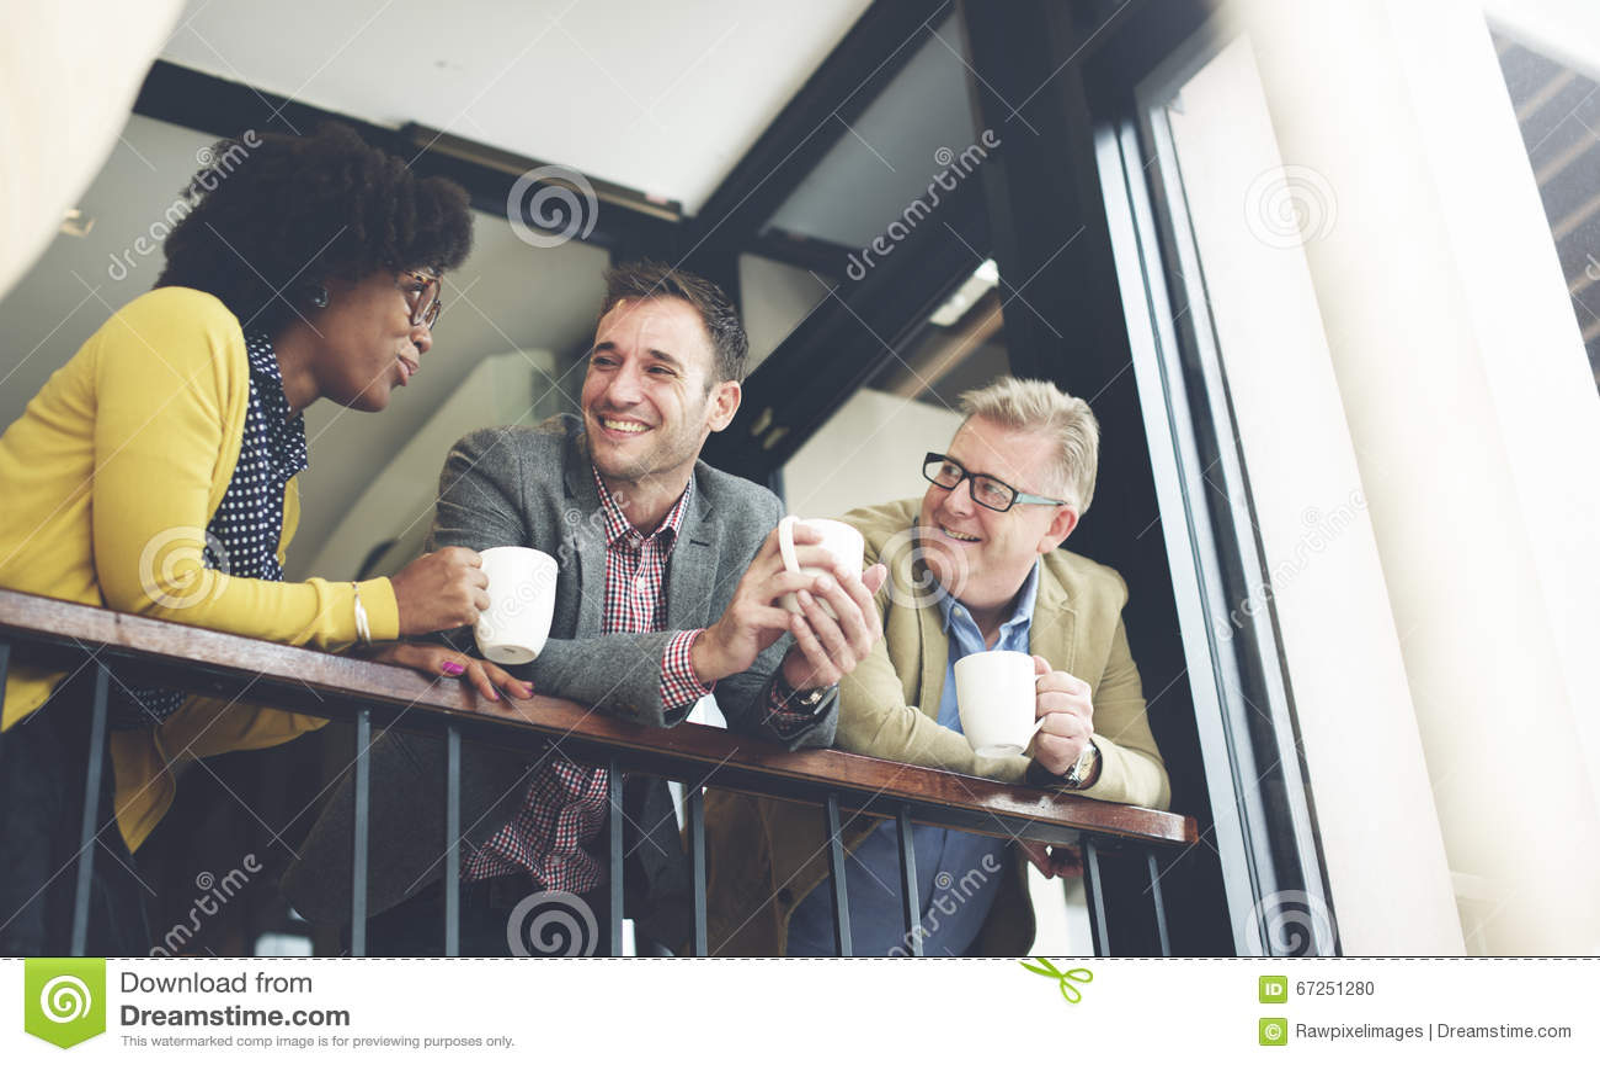 AffärsTeam Coffee Break Discussion Talking begrepp